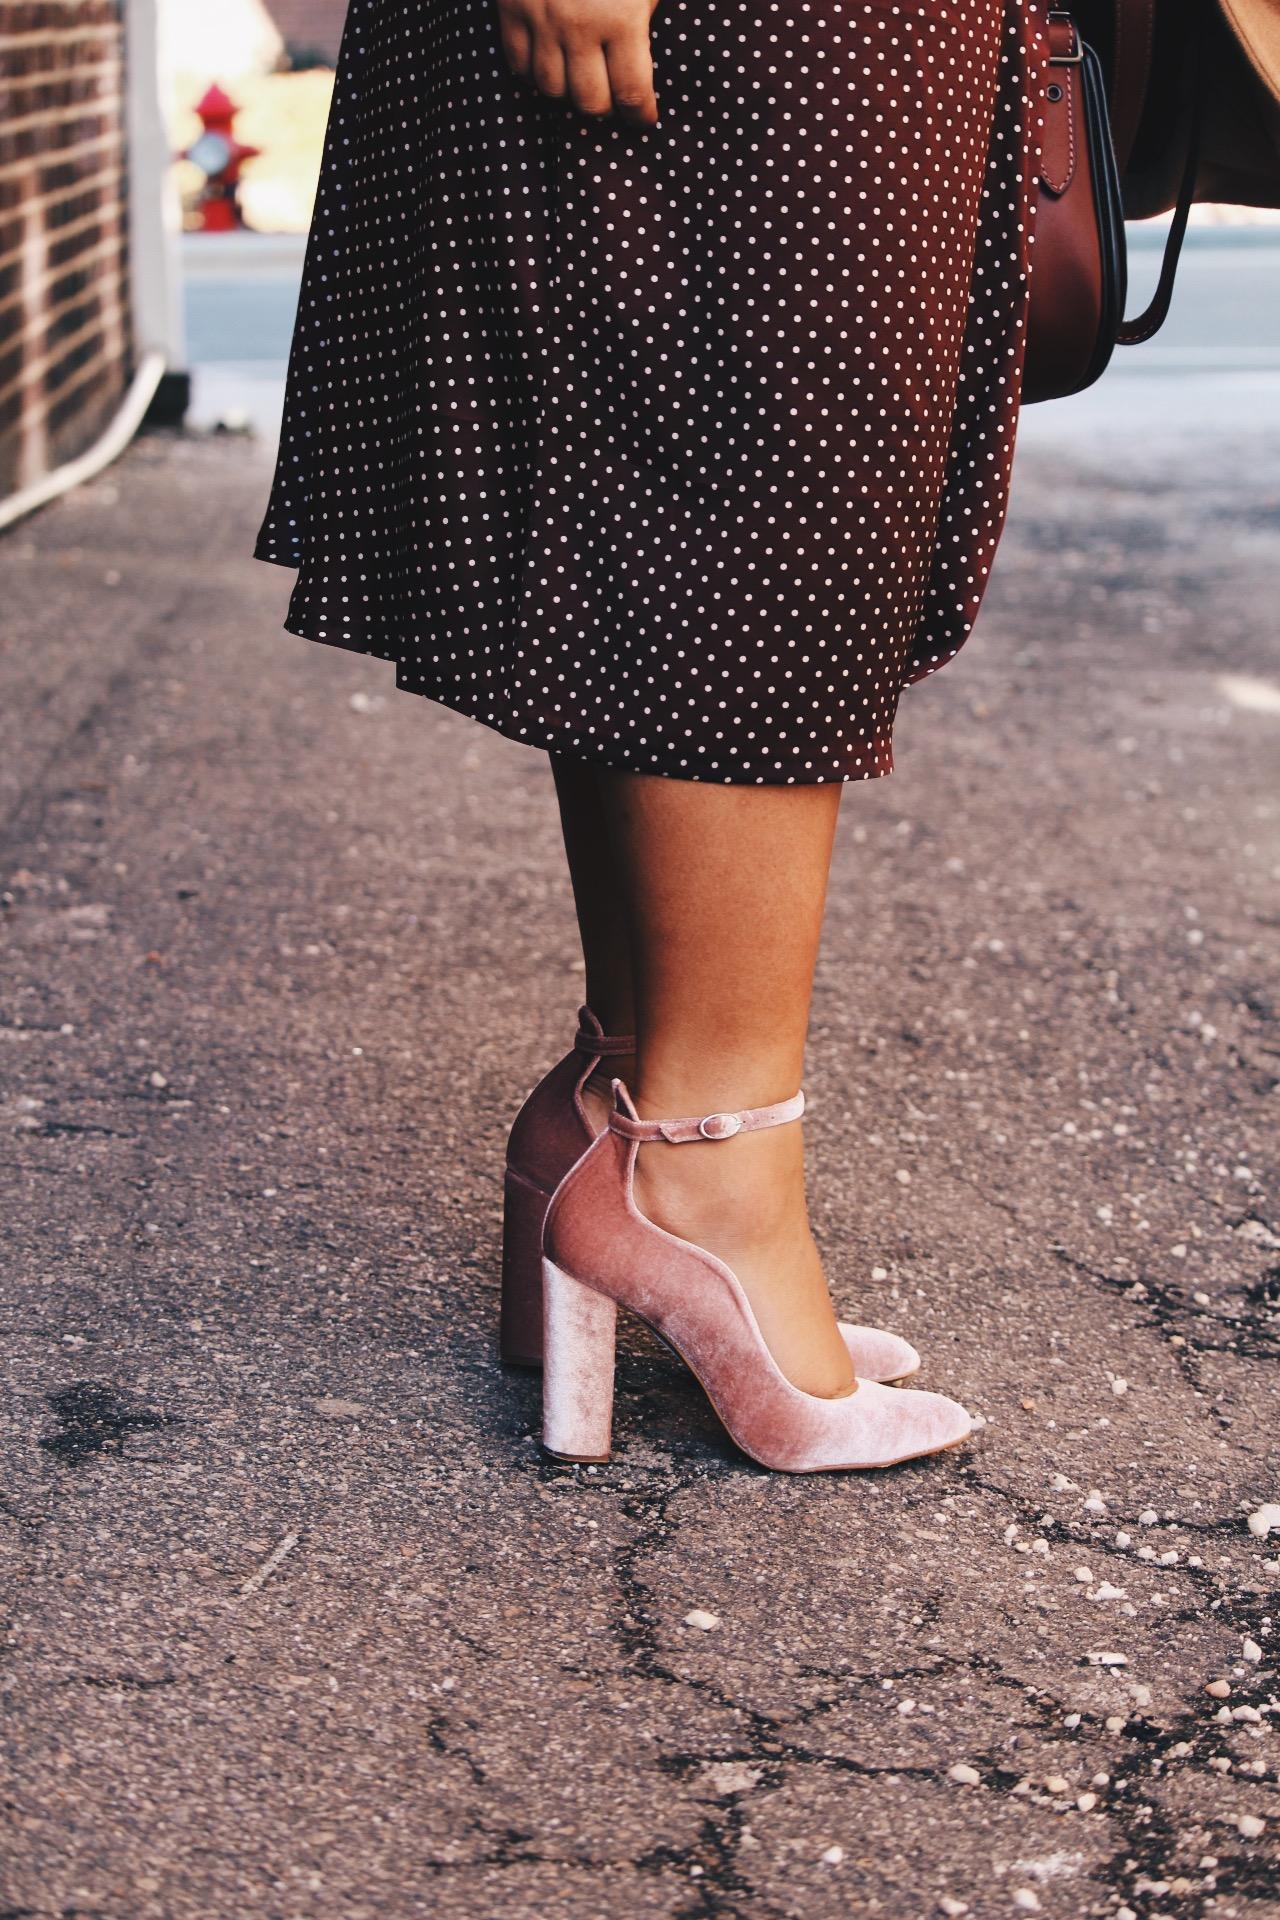 Zara-polka-dot-blouse-and-skirt-urban-outfitters-camel-coat-coach-saddle-bag-topshop-gracie-velvet-heels-similar-aquazurra-alix-pumps-womens-workwear-fashion-18.JPG